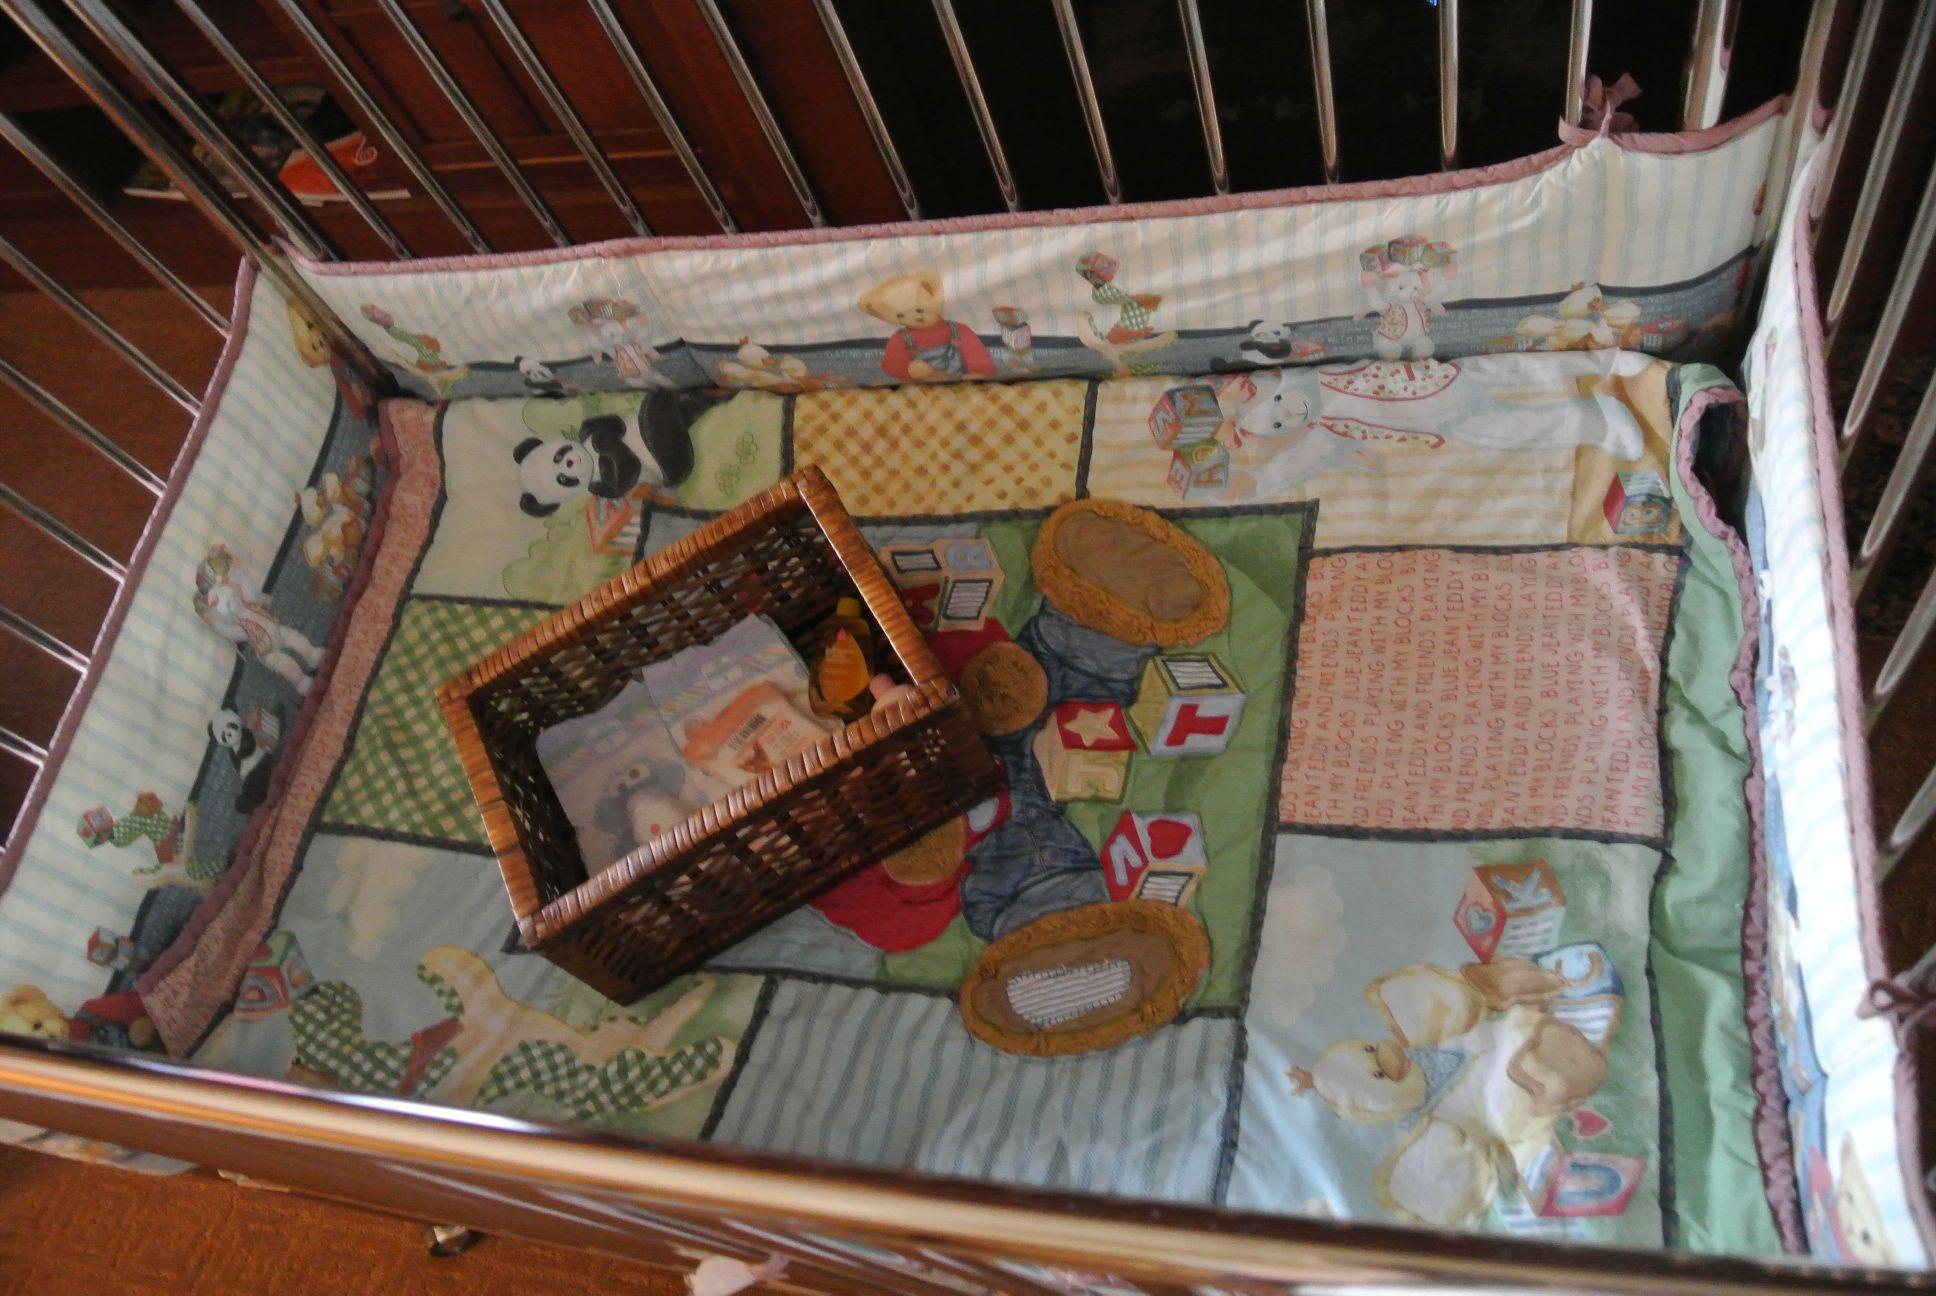 Four Seasons Whistler Crib ammenities